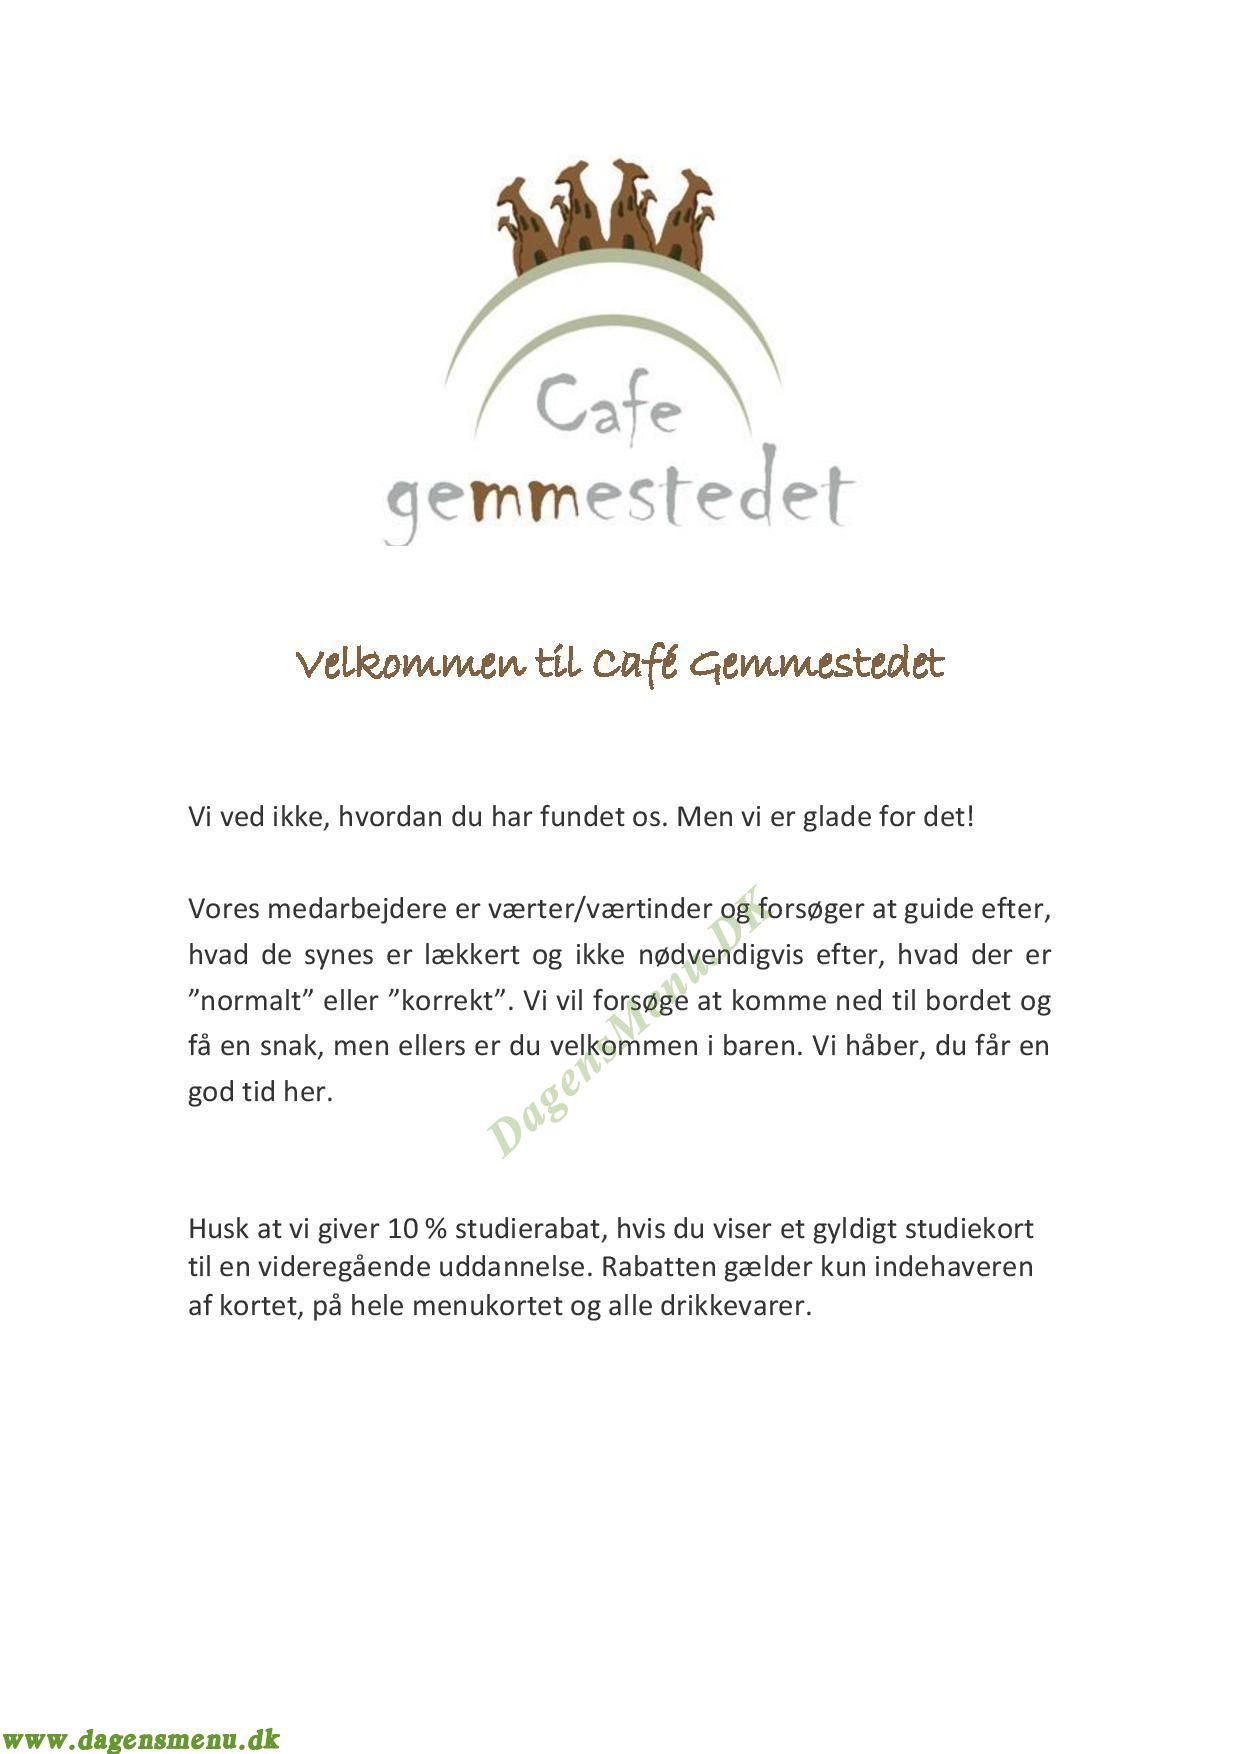 Café Gemmestedet - Menukort